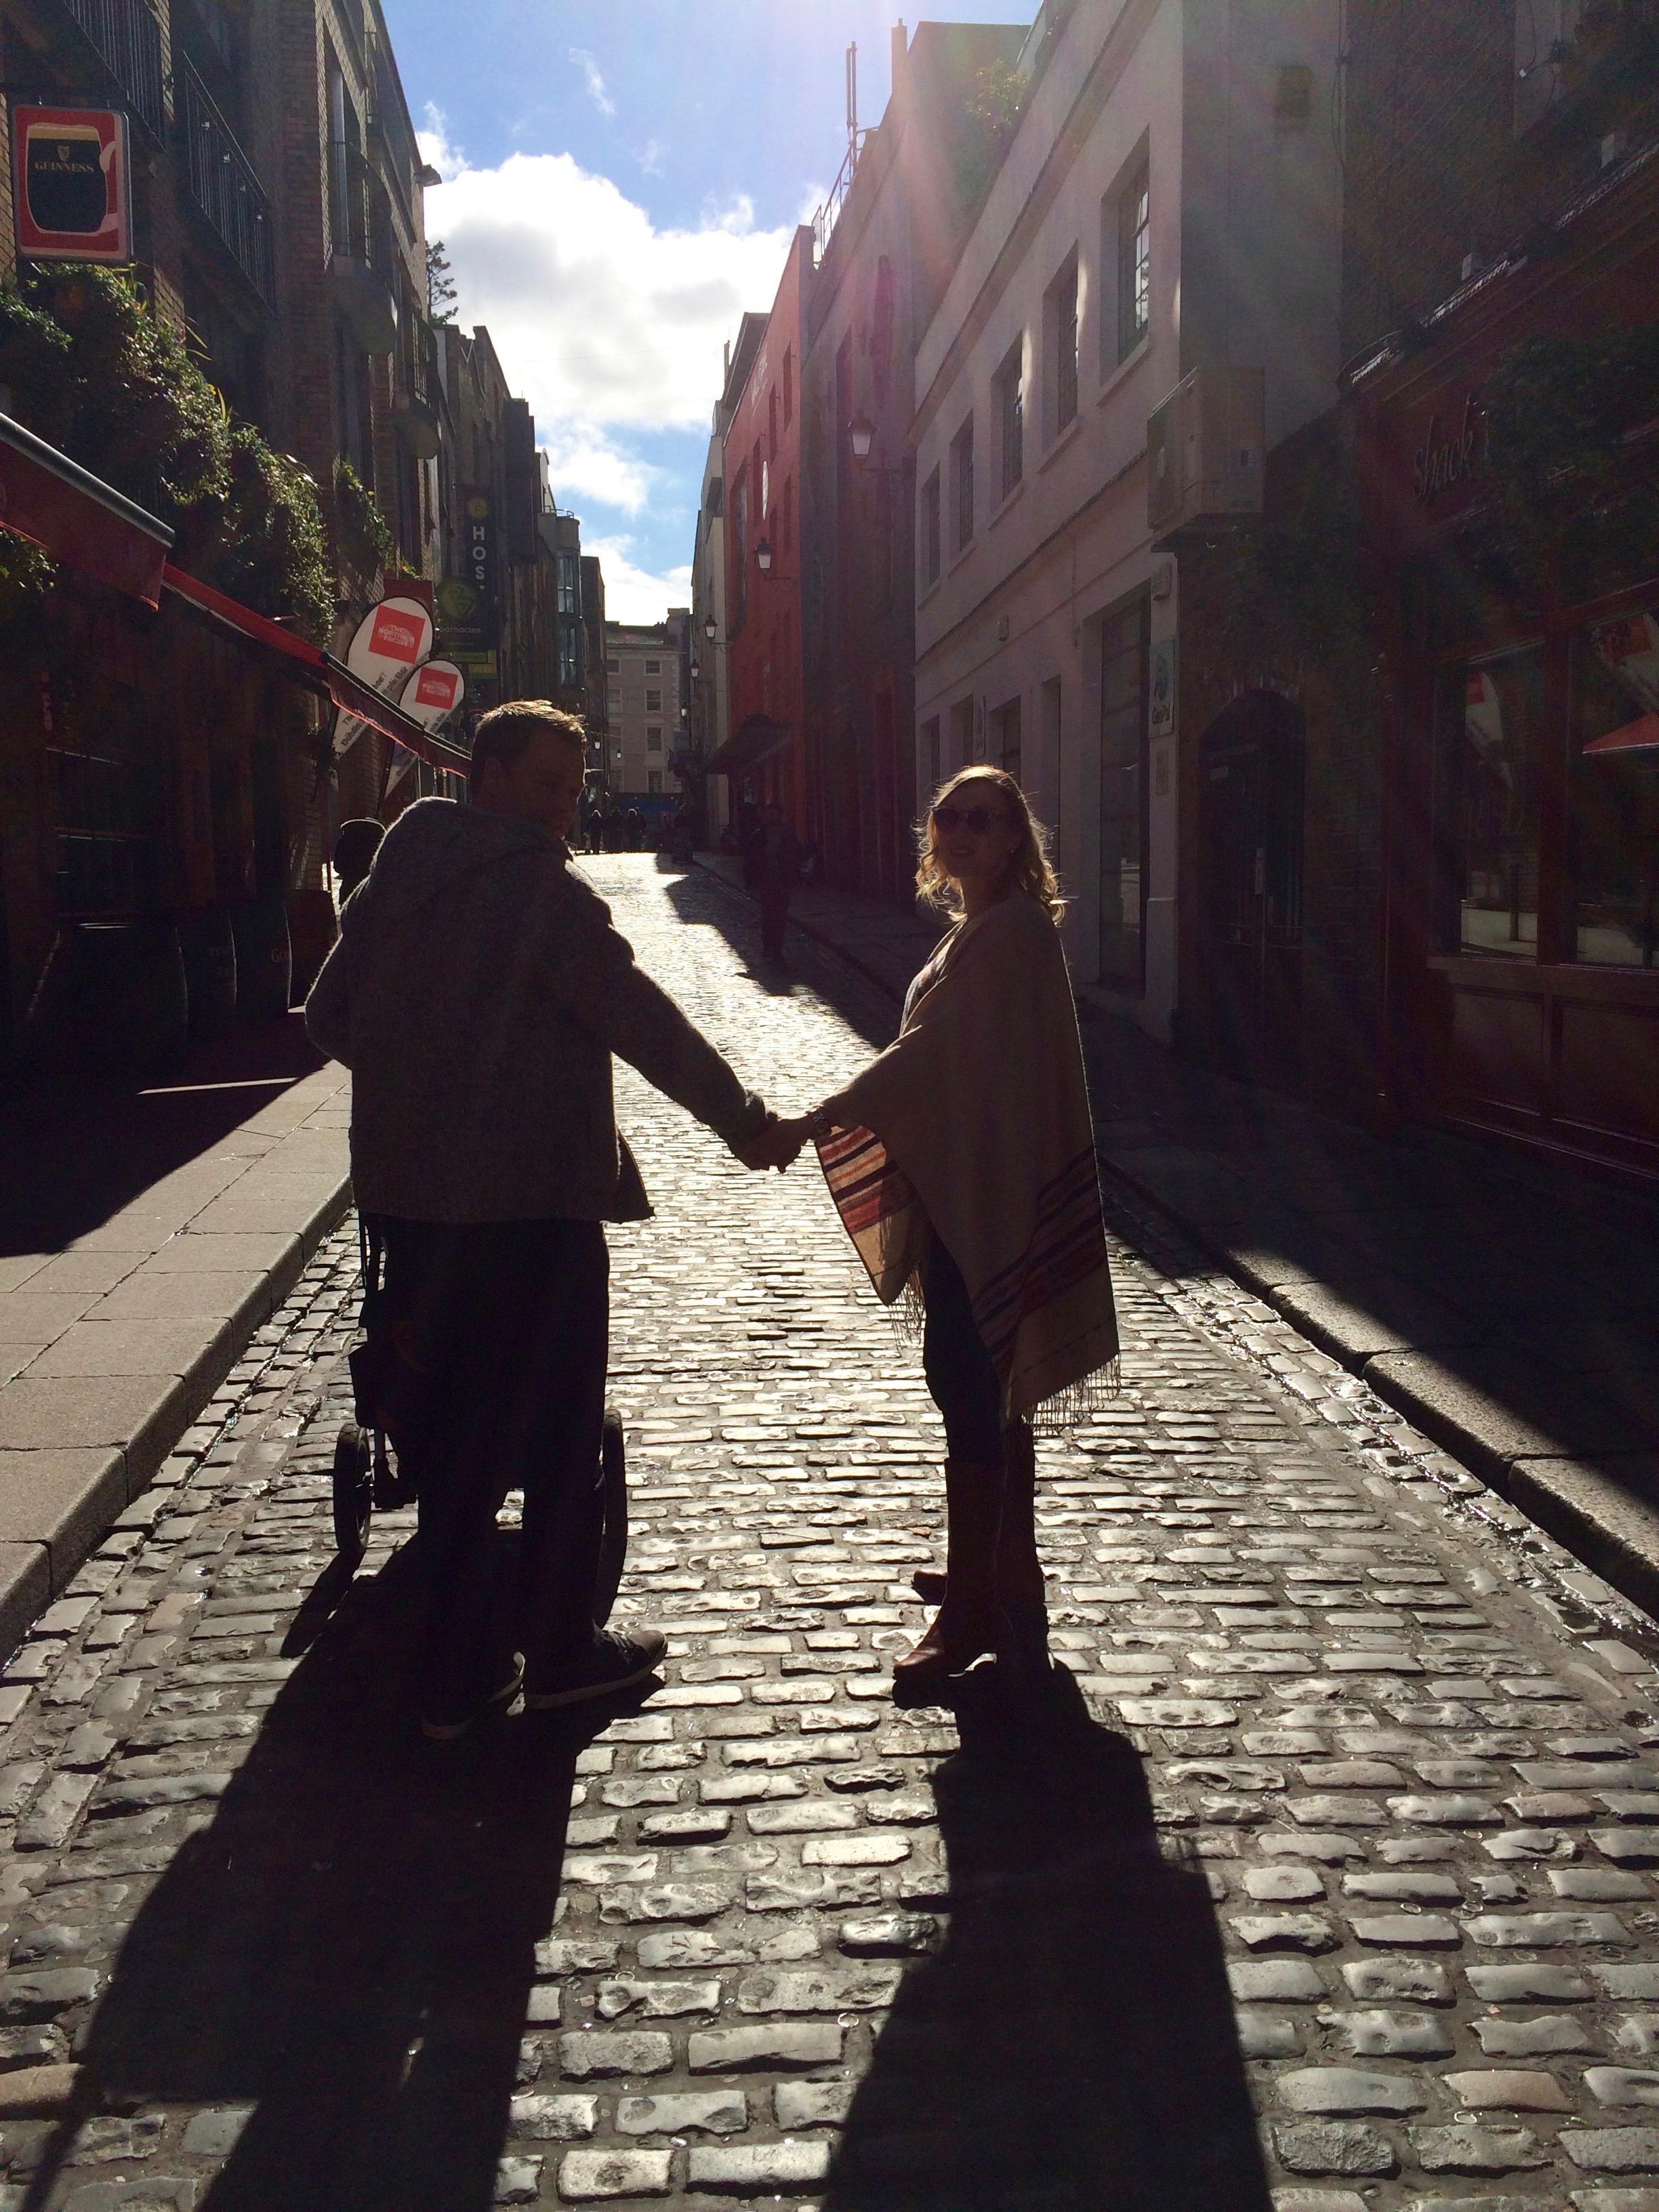 Dublin as a family. Travel Mad Mum and family in Dublin.